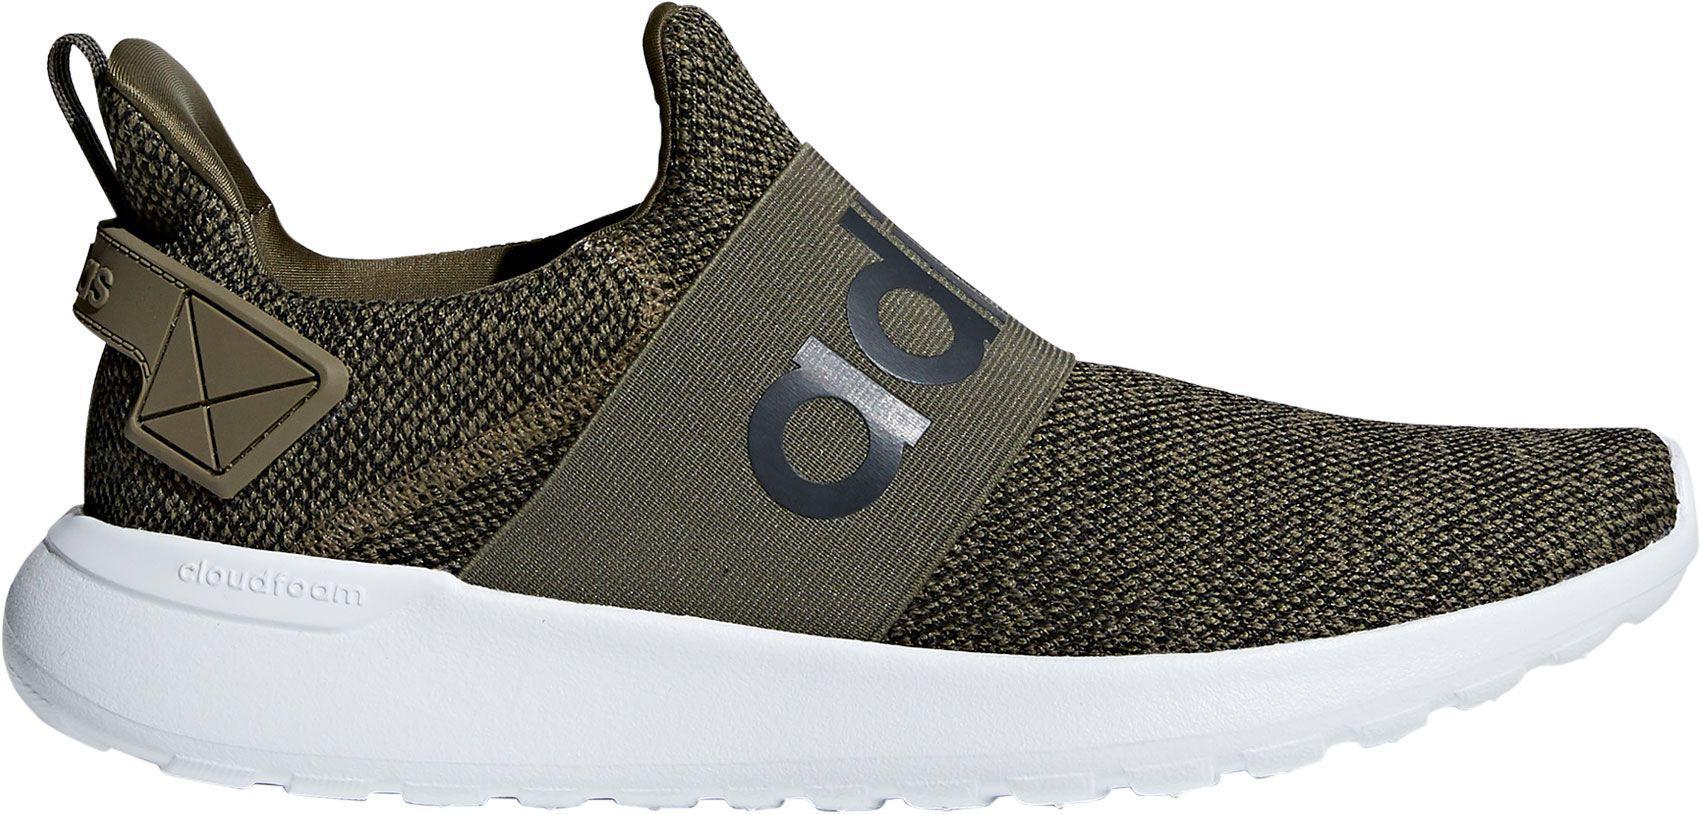 adidas lite racer adapt green- OFF 52